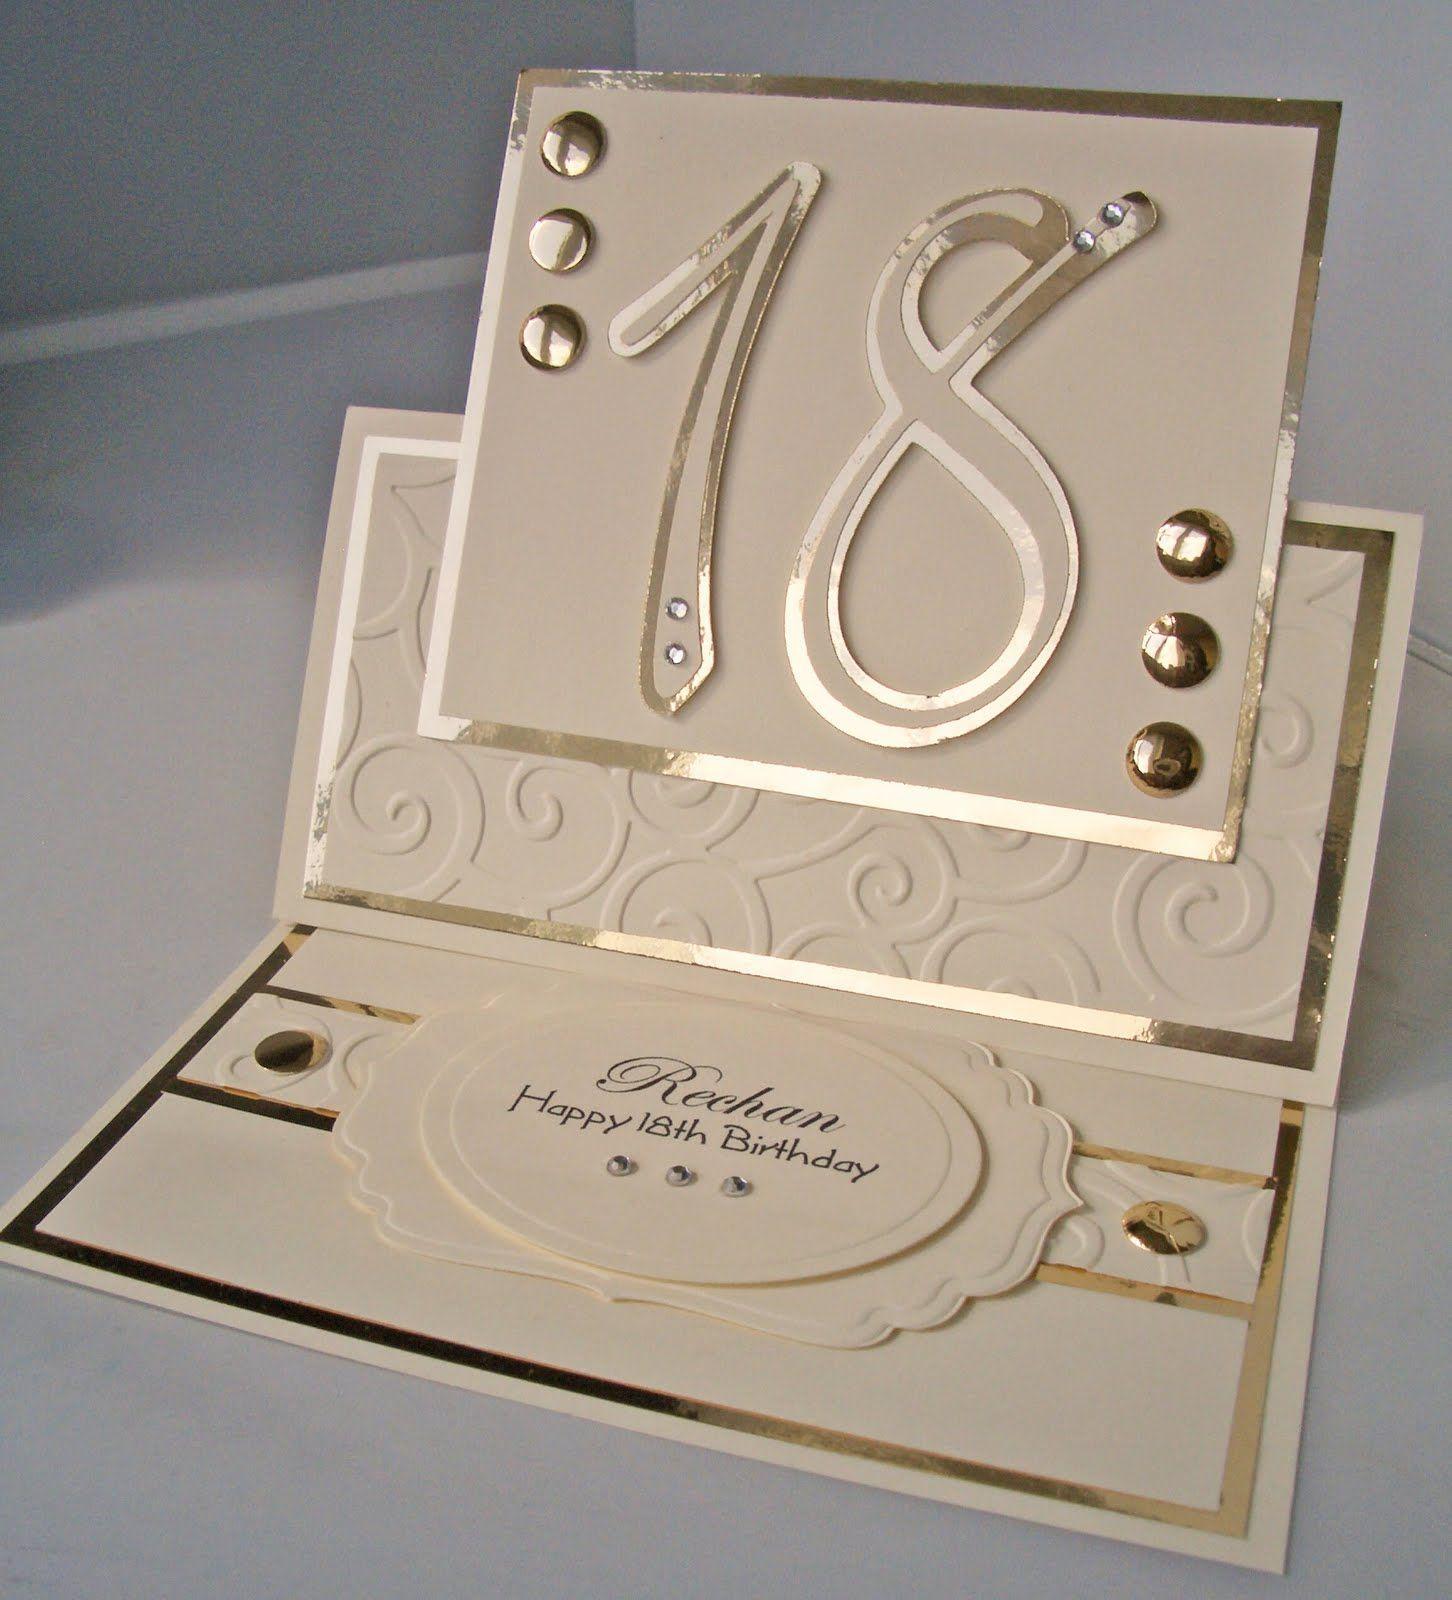 18th Birthday Easel Card 18th birthday cards, 21st